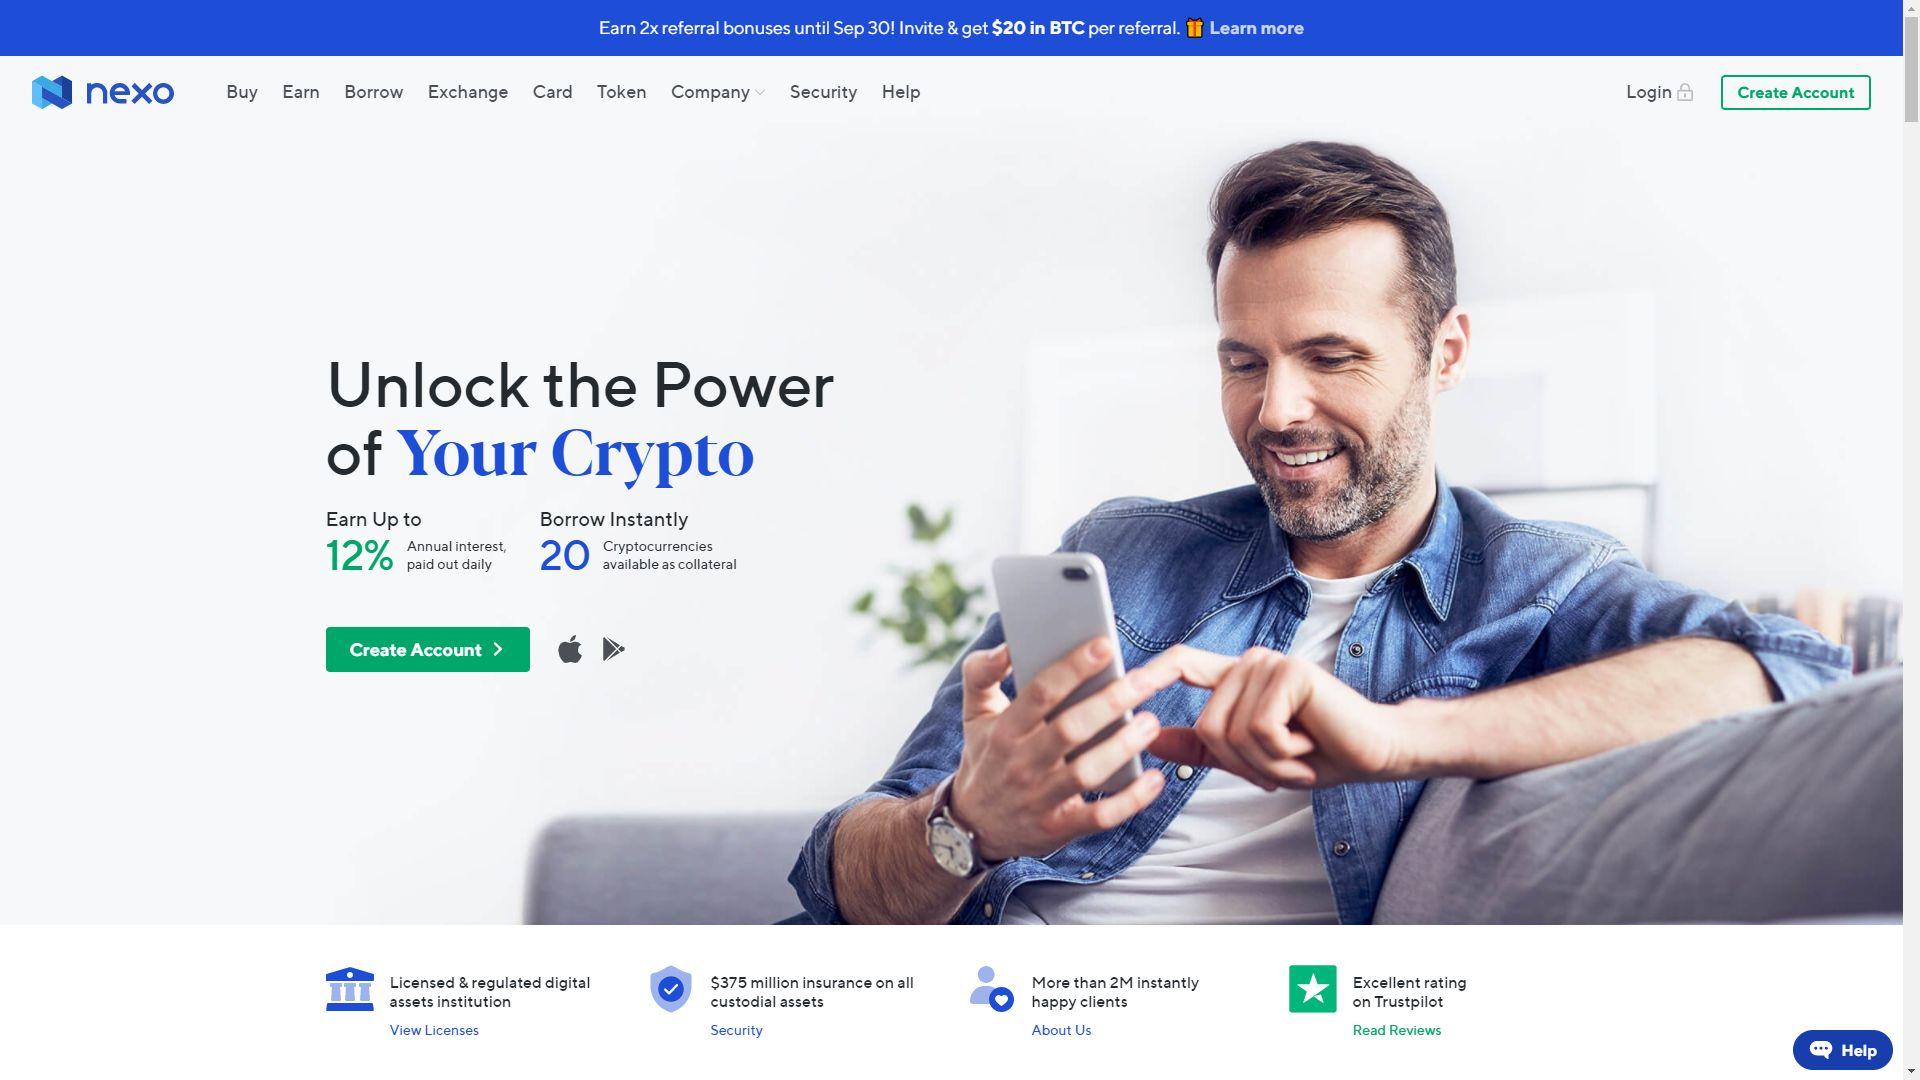 Nexo.io - serwis kryptowalut i lokata w jednym